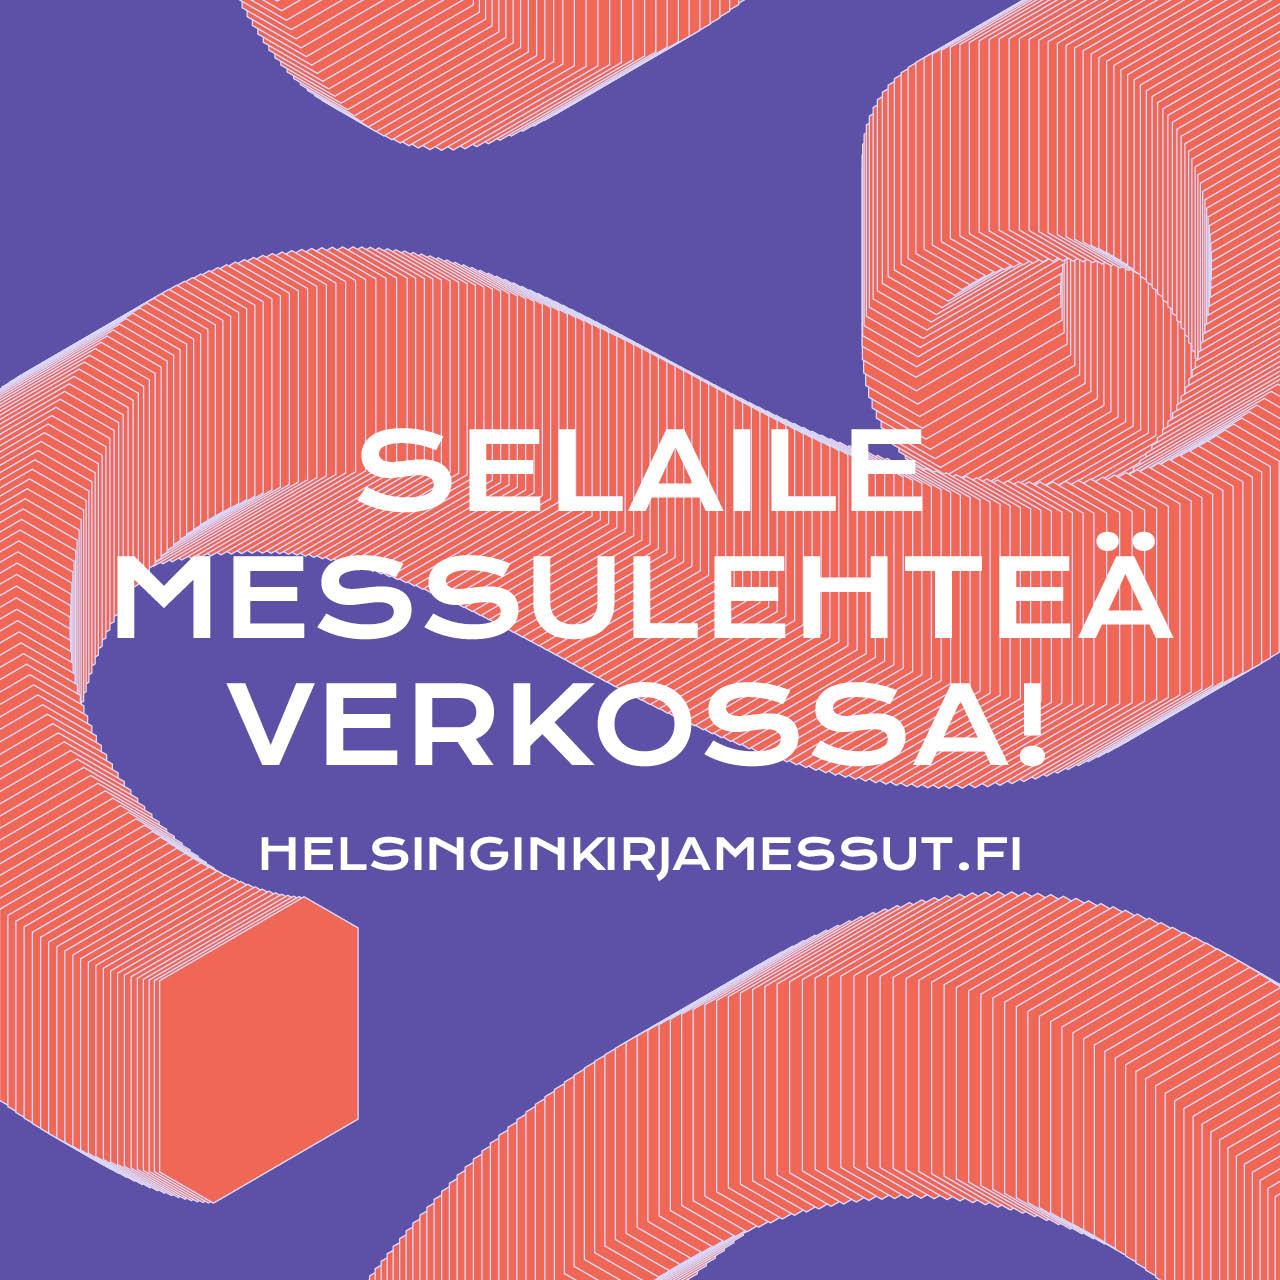 Helsingin kirjamessut verkossa 2020